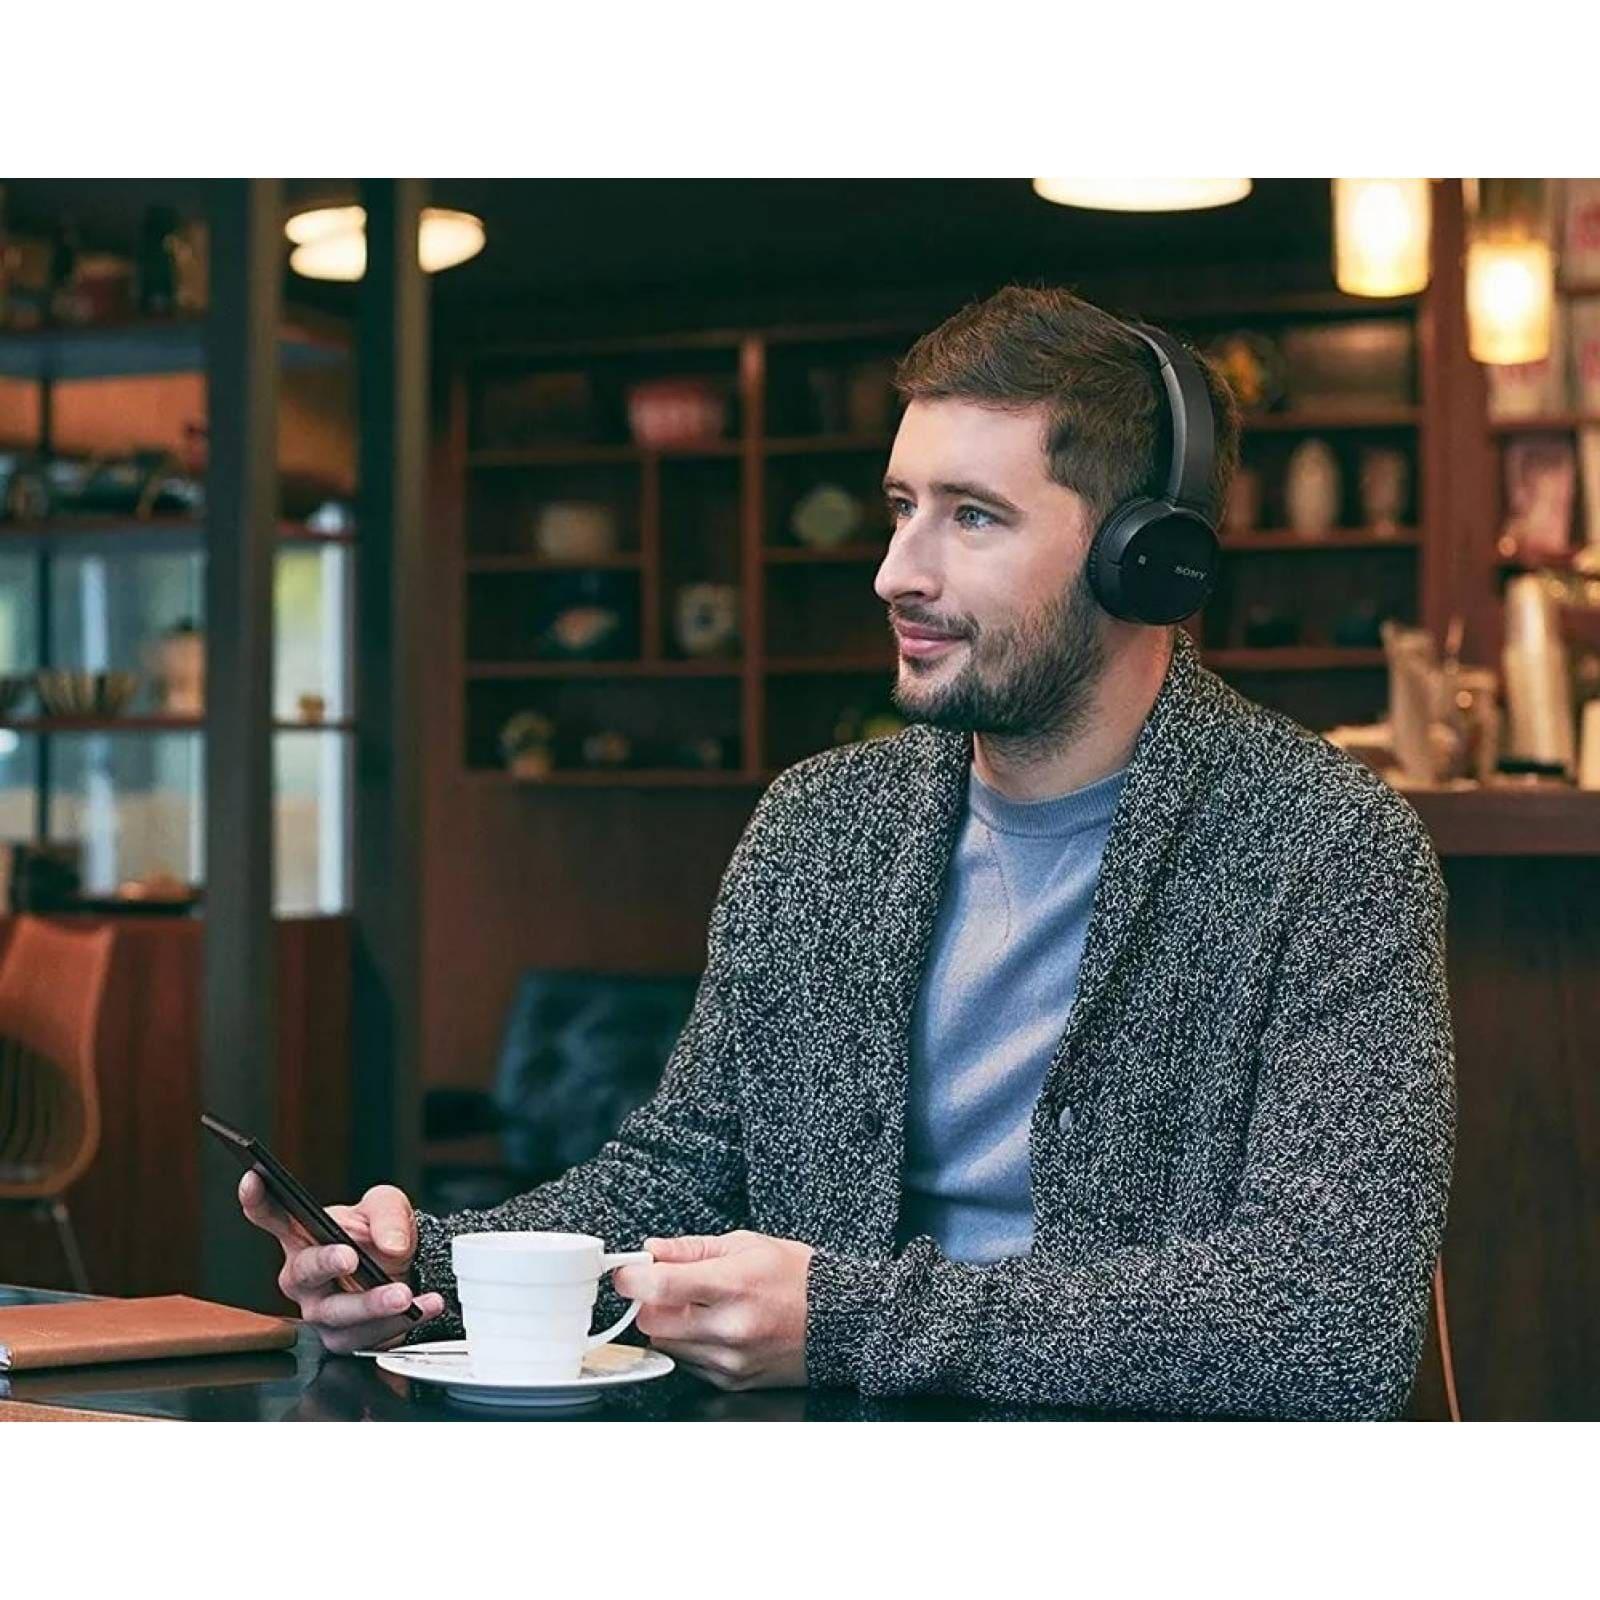 Audifonos Inalámbricos Sony Bluetooth Manos Libres Wh-ch500 Negro